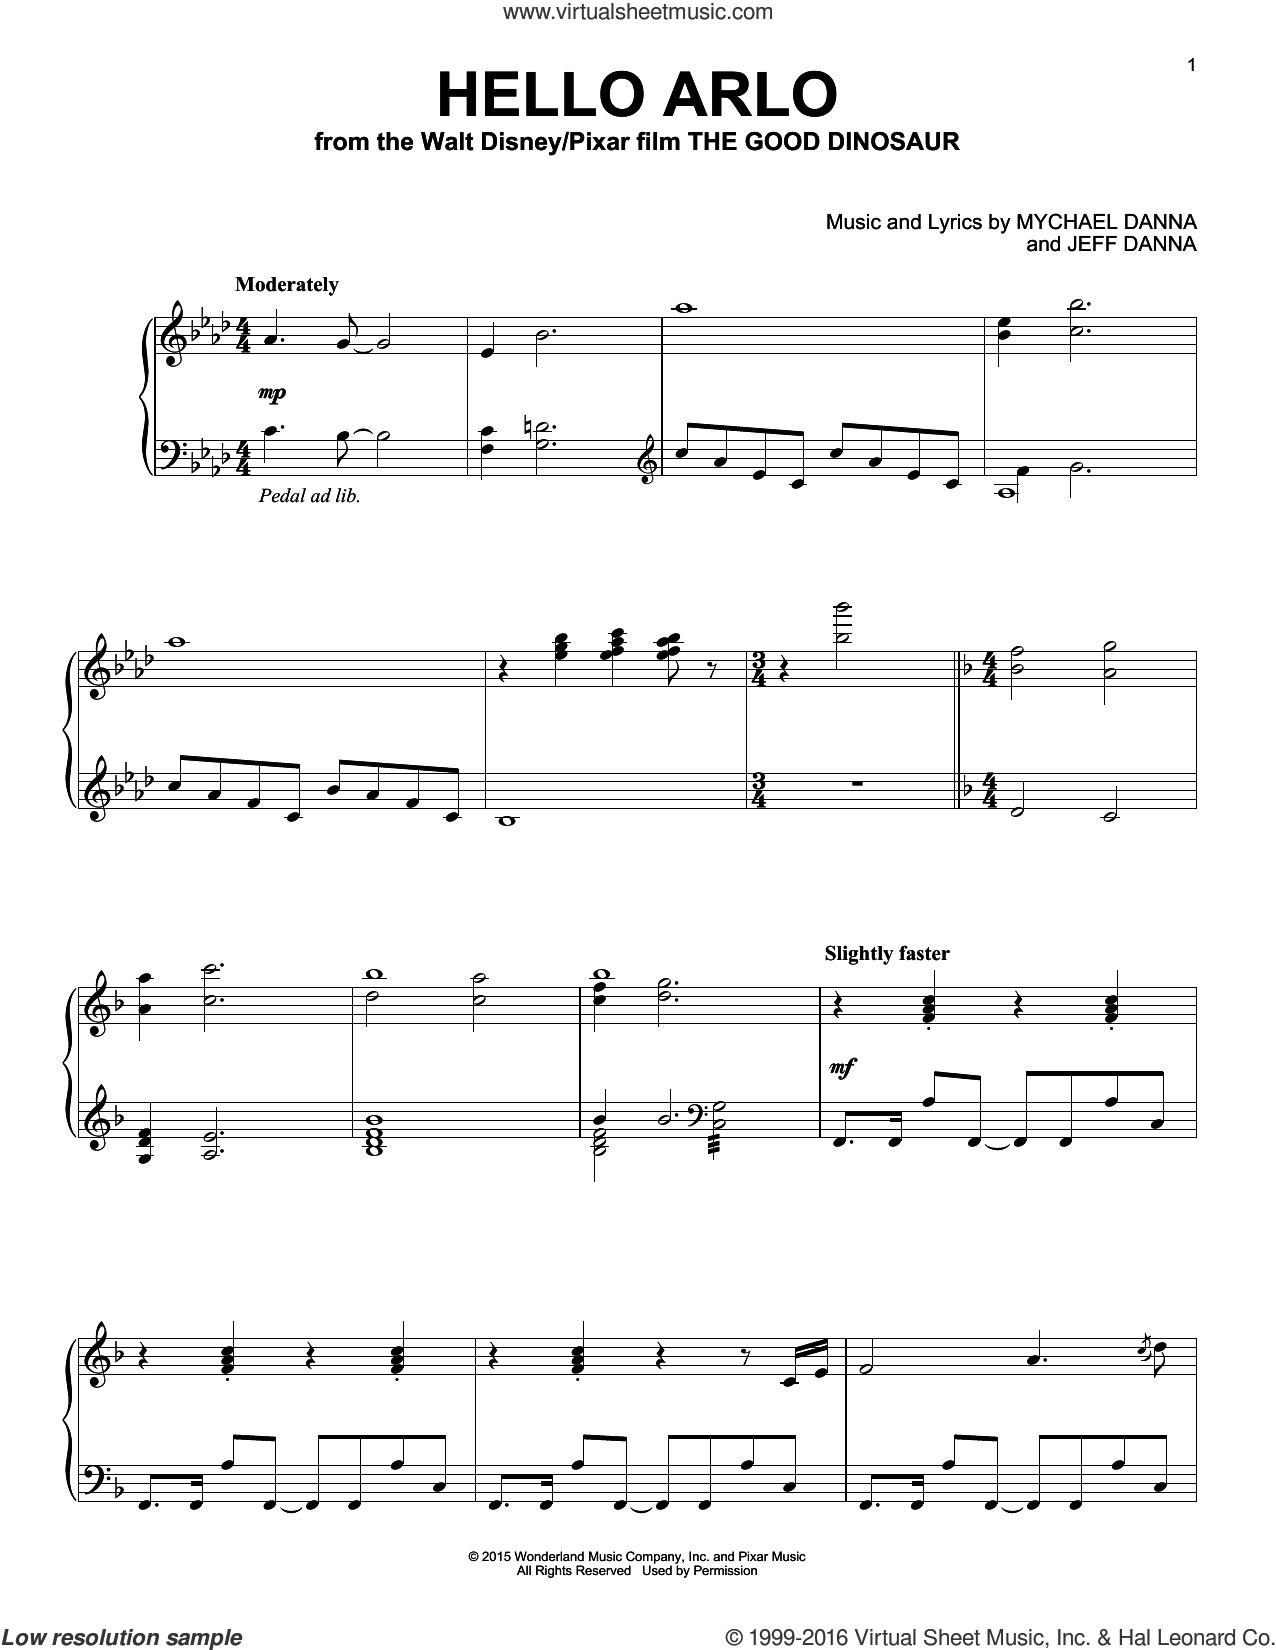 Hello Arlo sheet music for piano solo by Mychael & Jeff Danna, Jeff Danna and Mychael Danna, intermediate skill level